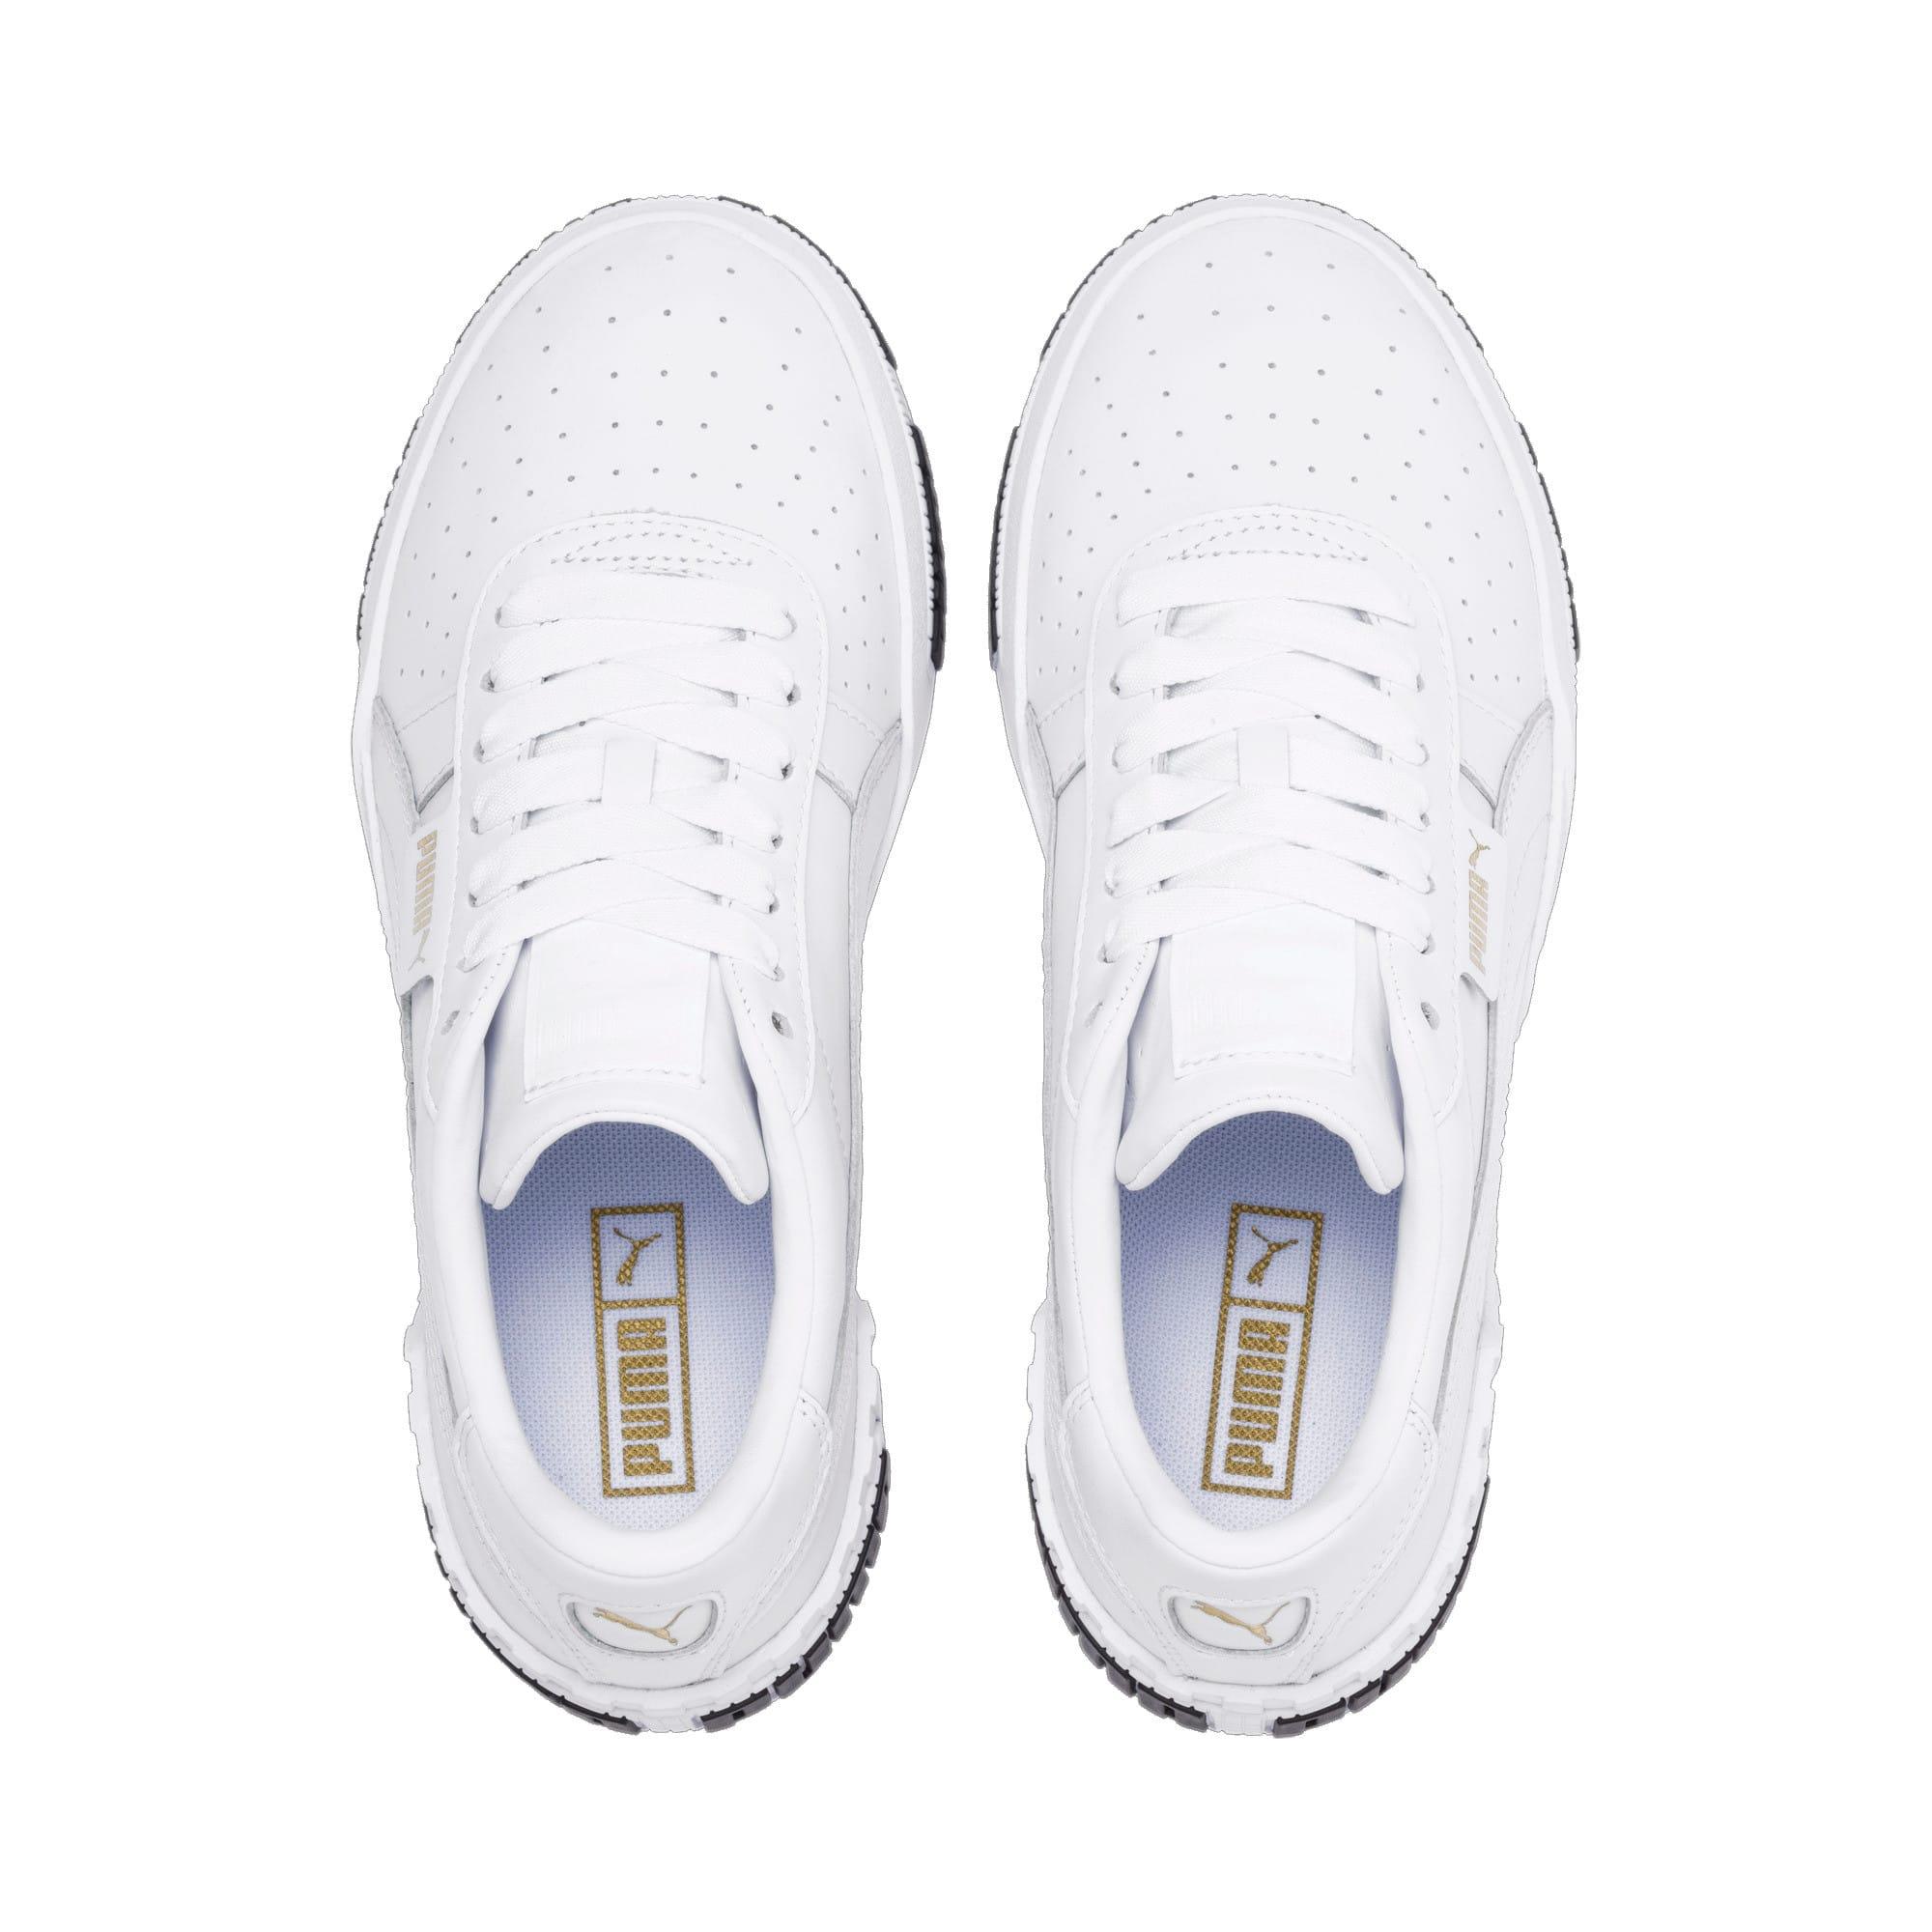 Thumbnail 8 of Cali Bold Women's Sneakers, Puma White-Metallic Gold, medium